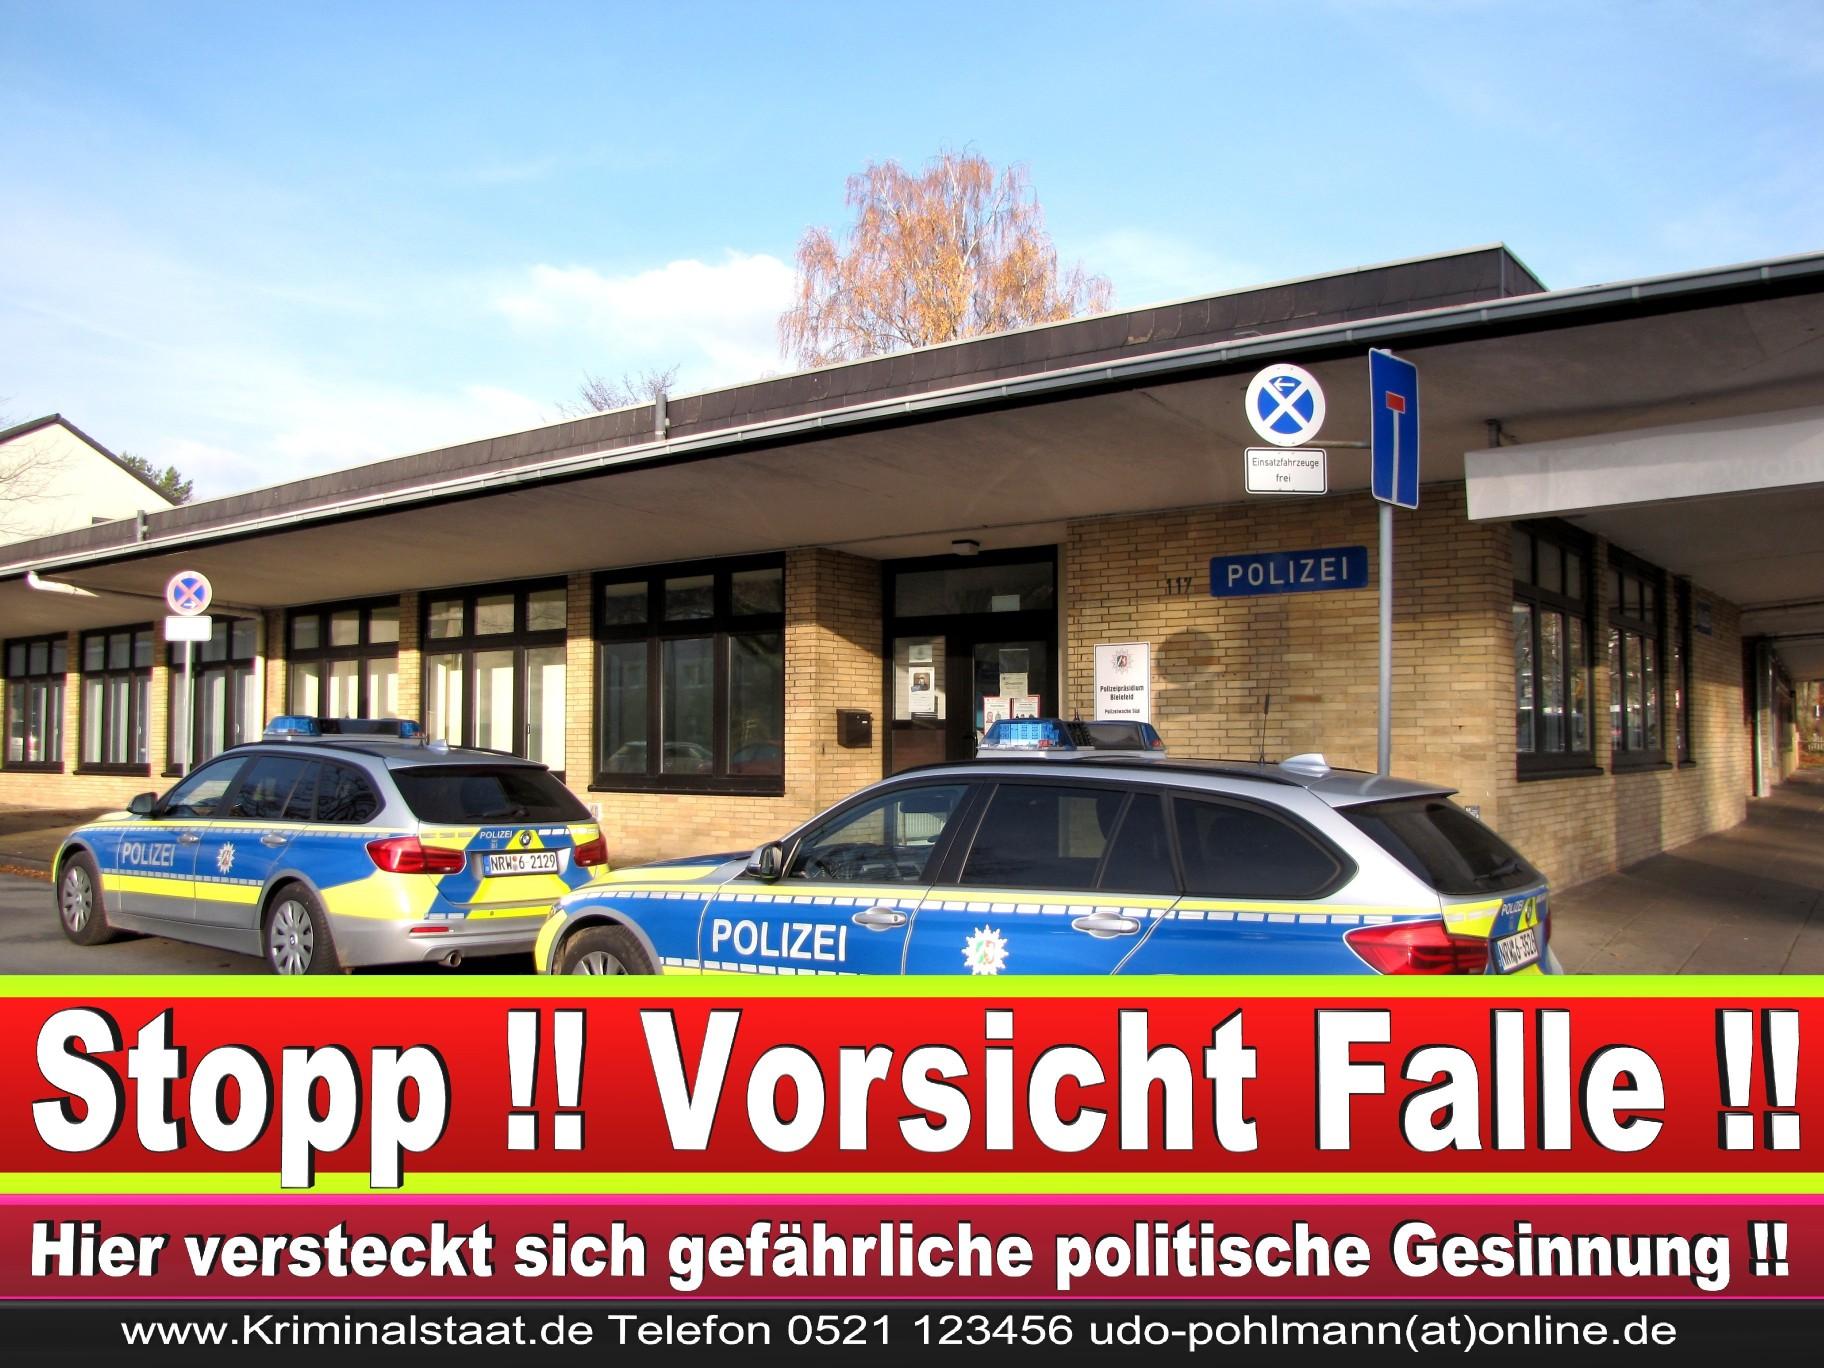 Polizei Bielefeld Sennestadt Günter Vullhorst Korruption Öko Tech Park 17 07 (7)